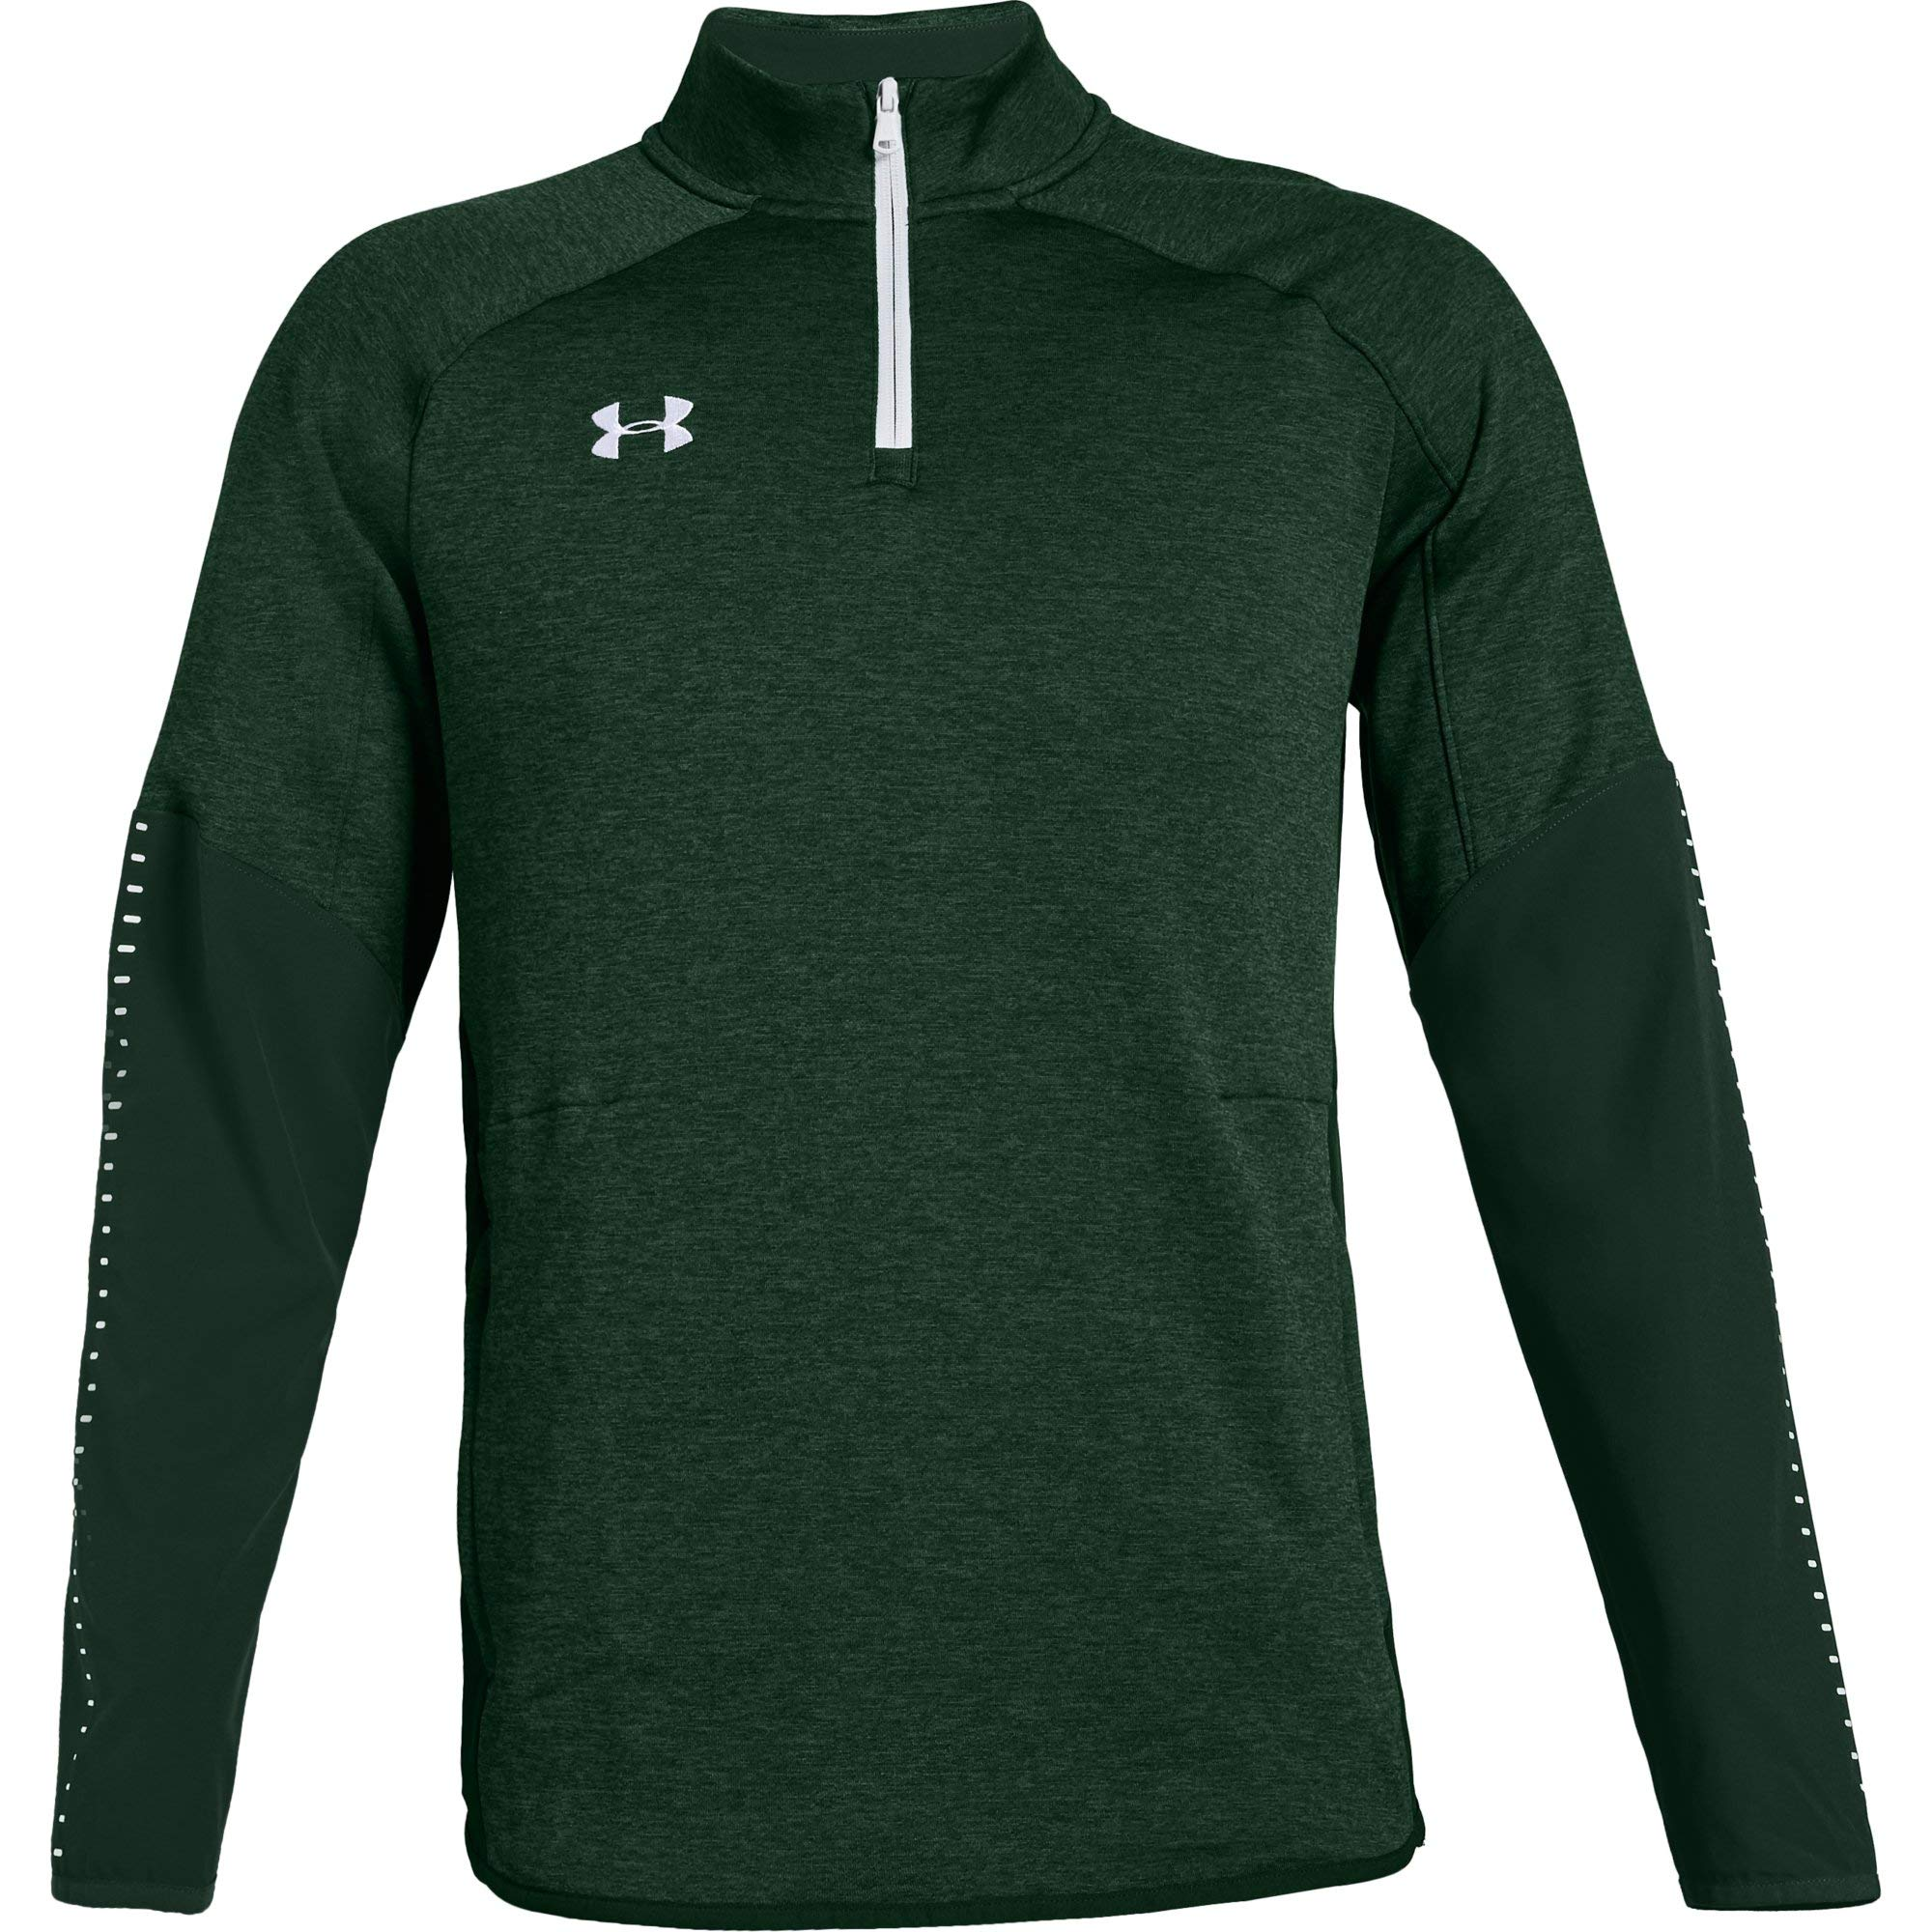 Under Armour Men's UA Qualifier Hybrid 1/4 Zip Long Sleeve (XX-Large, Forest Green)